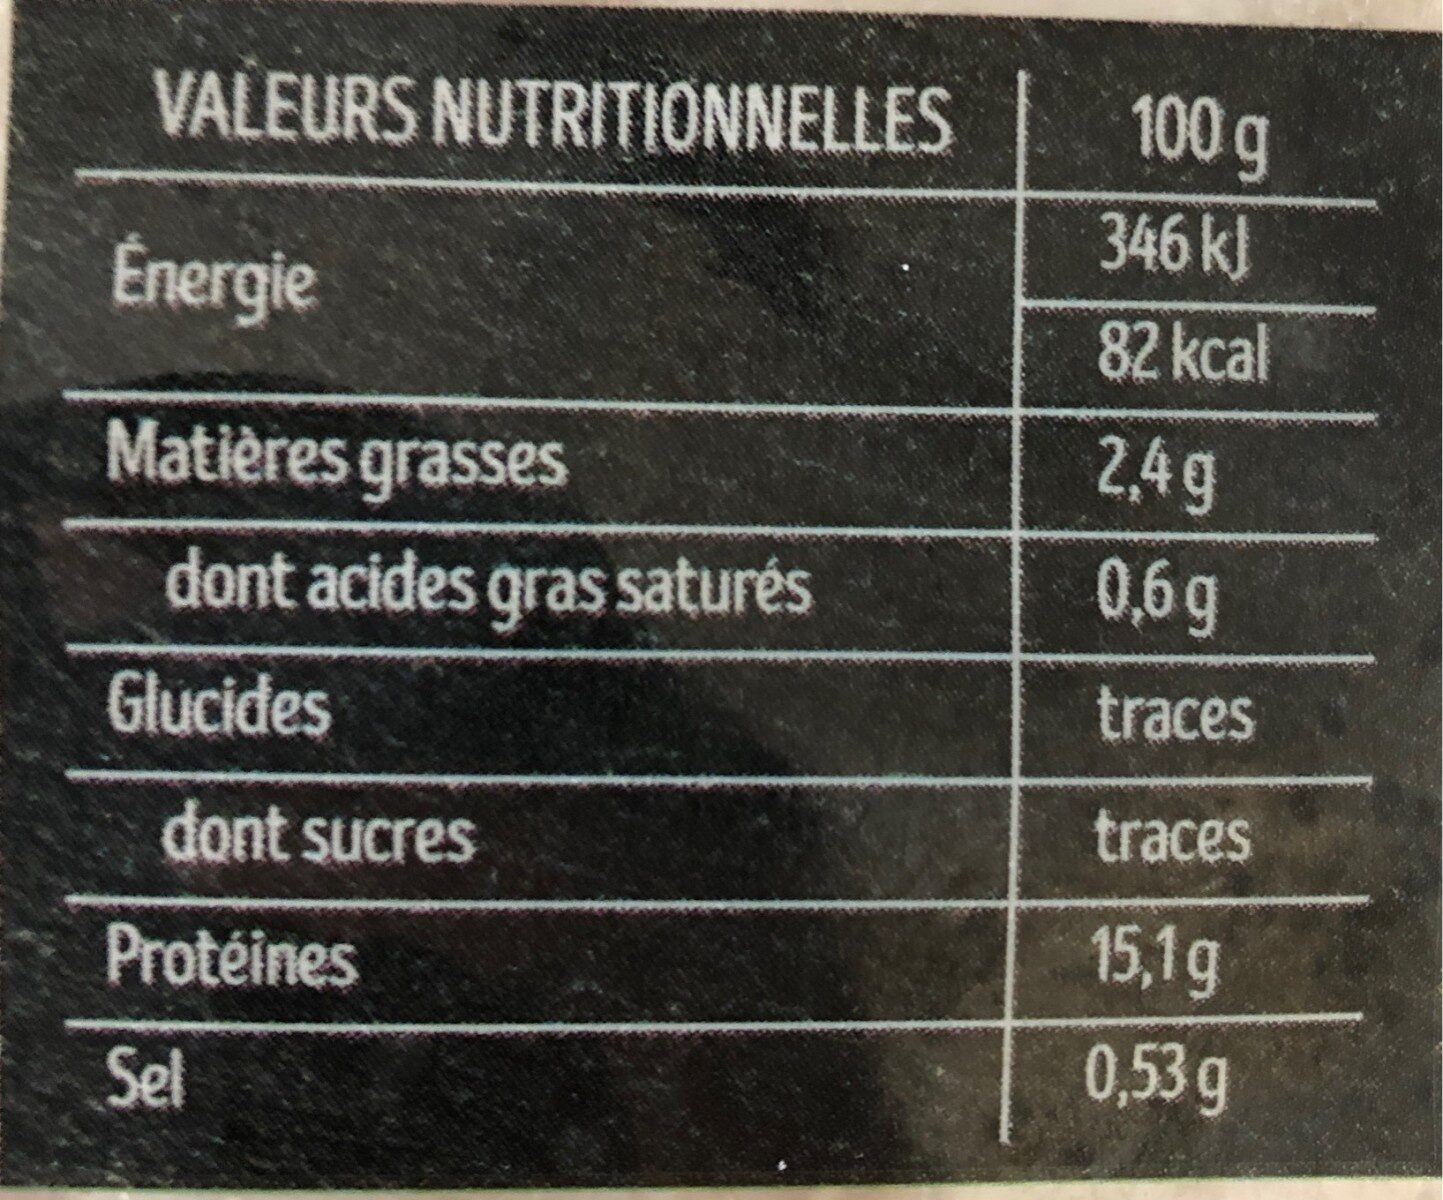 Filets de merlu blanc - Informations nutritionnelles - fr